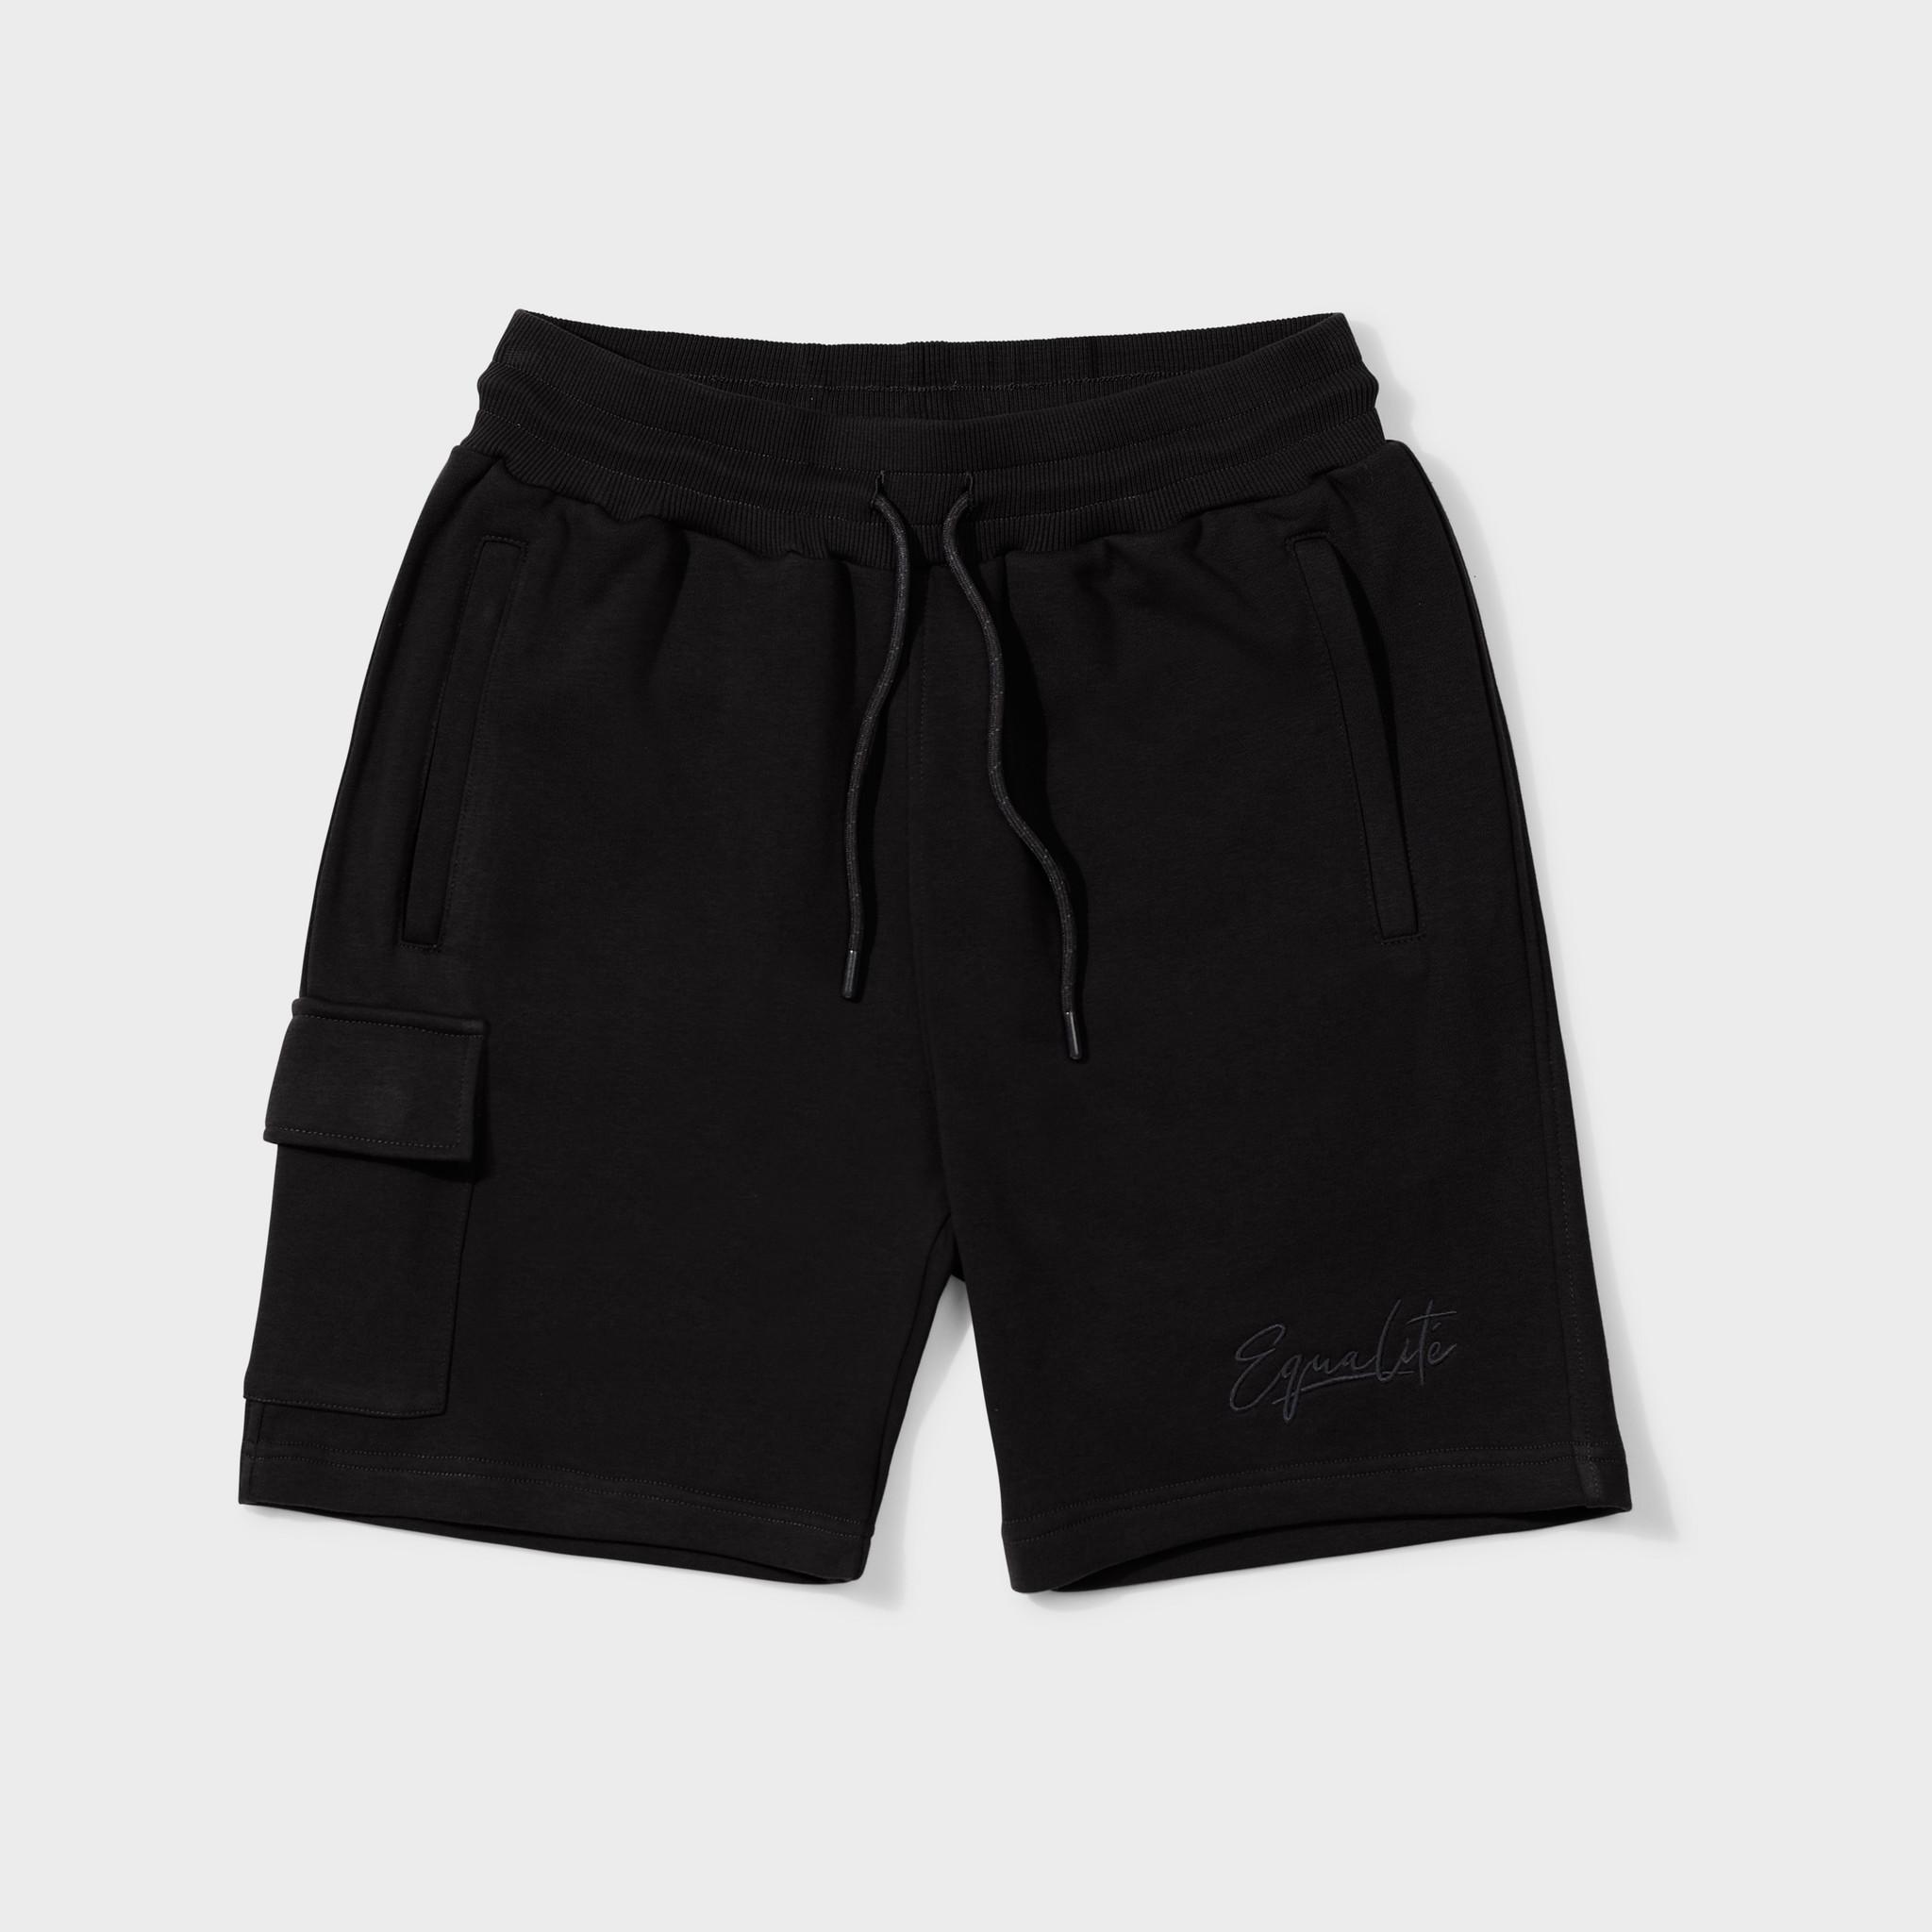 Wafi signature shorts black & antra-1